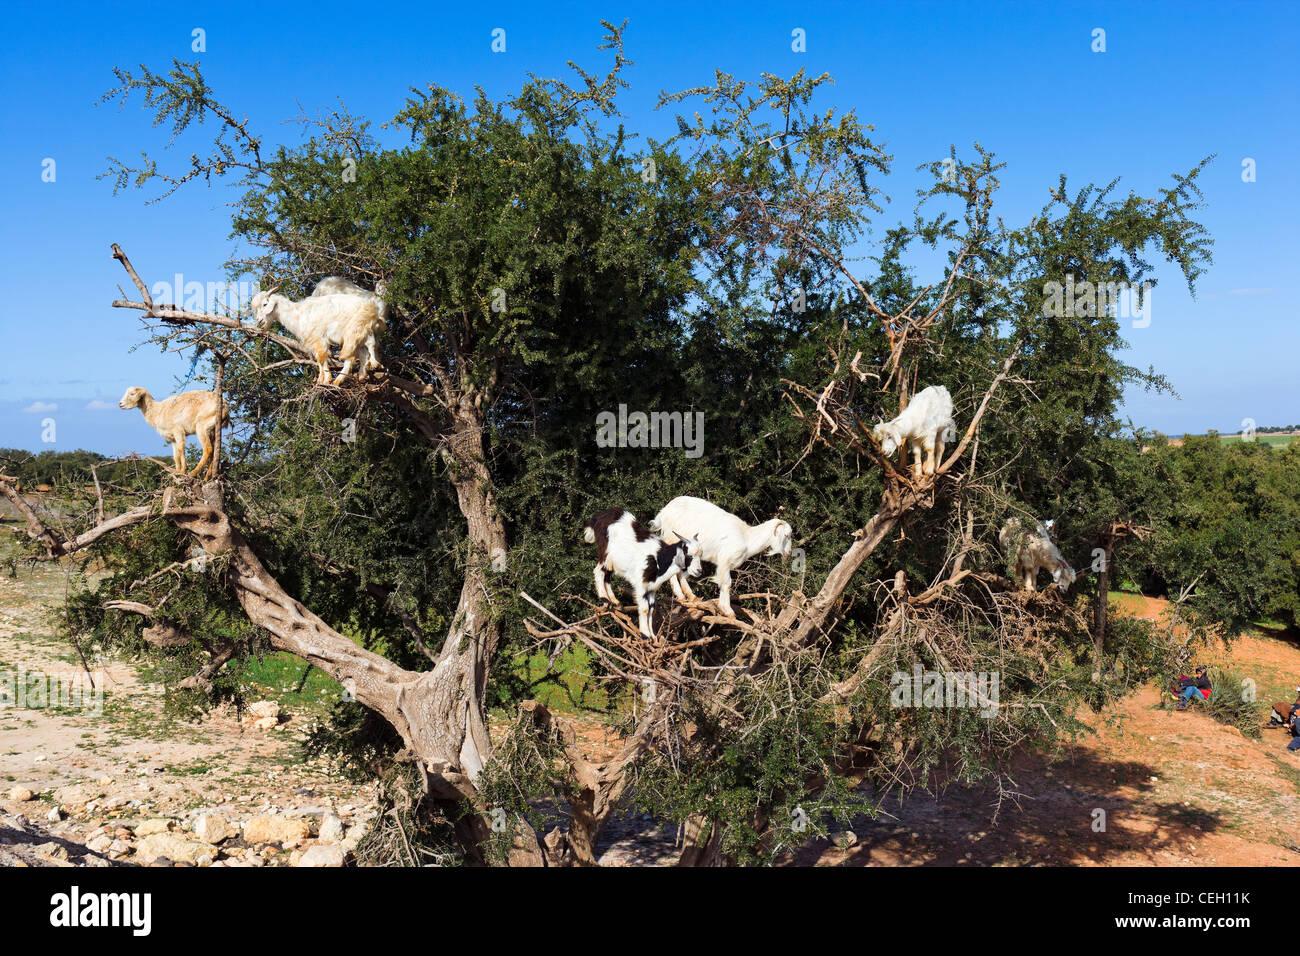 Goats climbing an Argan tree near Essaouira, Morocco, North Africa - Stock Image